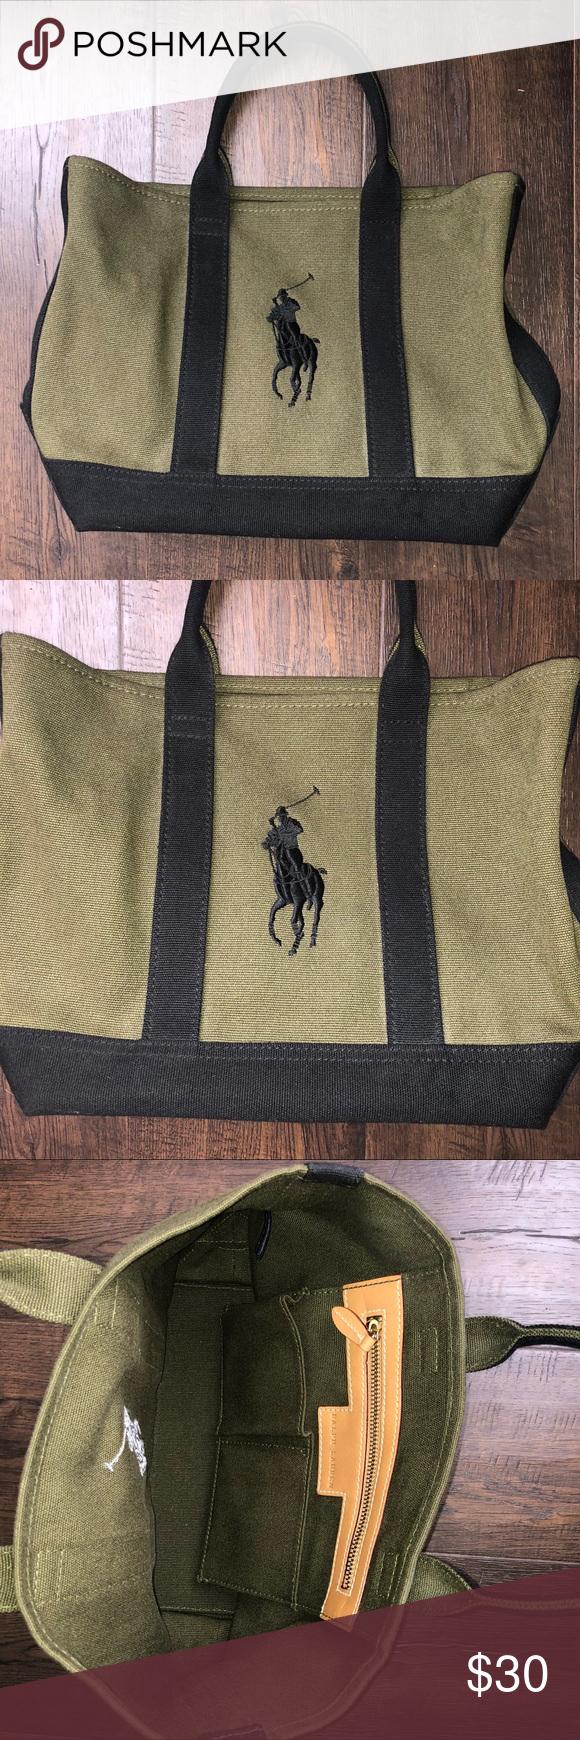 b6f7b31306d7 Ralph Lauren Small Canvas Tote Bag Ralph Lauren small canvas bag. Bag is  olive green